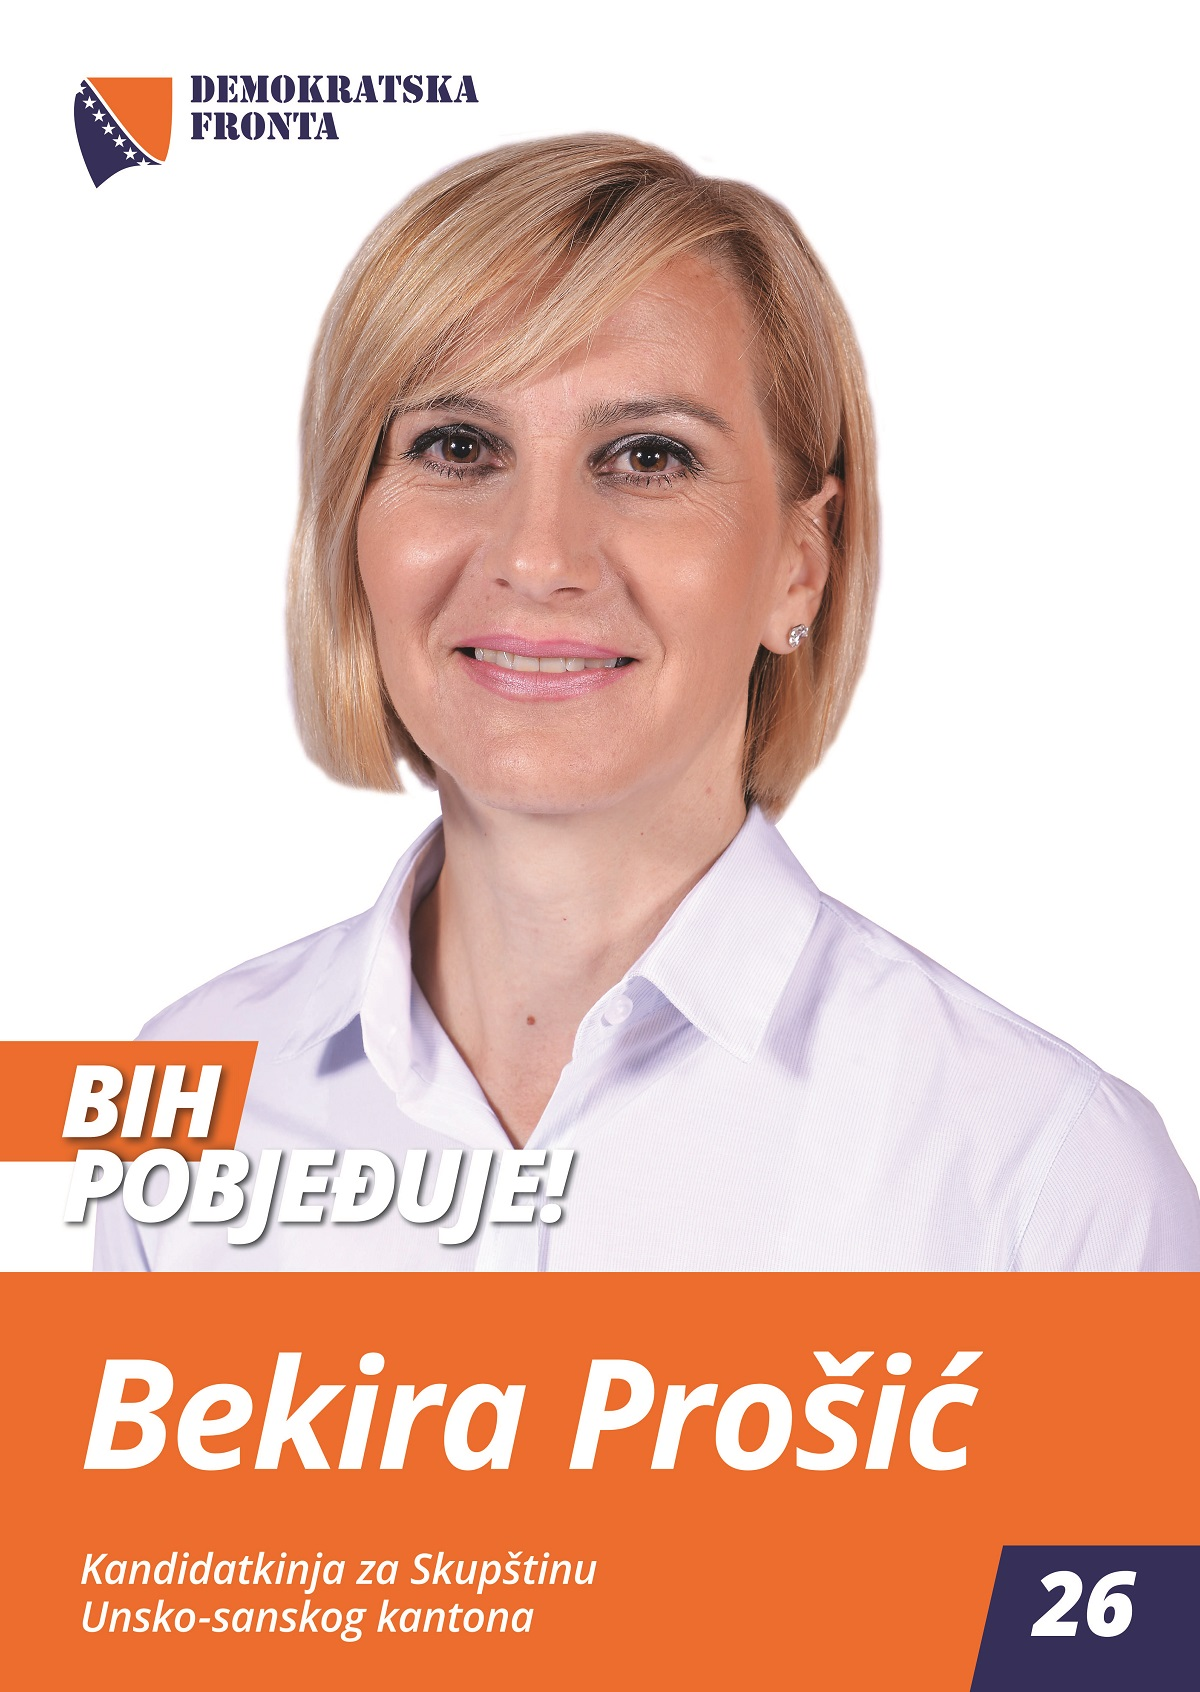 Bekira Prošić, diplomirani pravnik